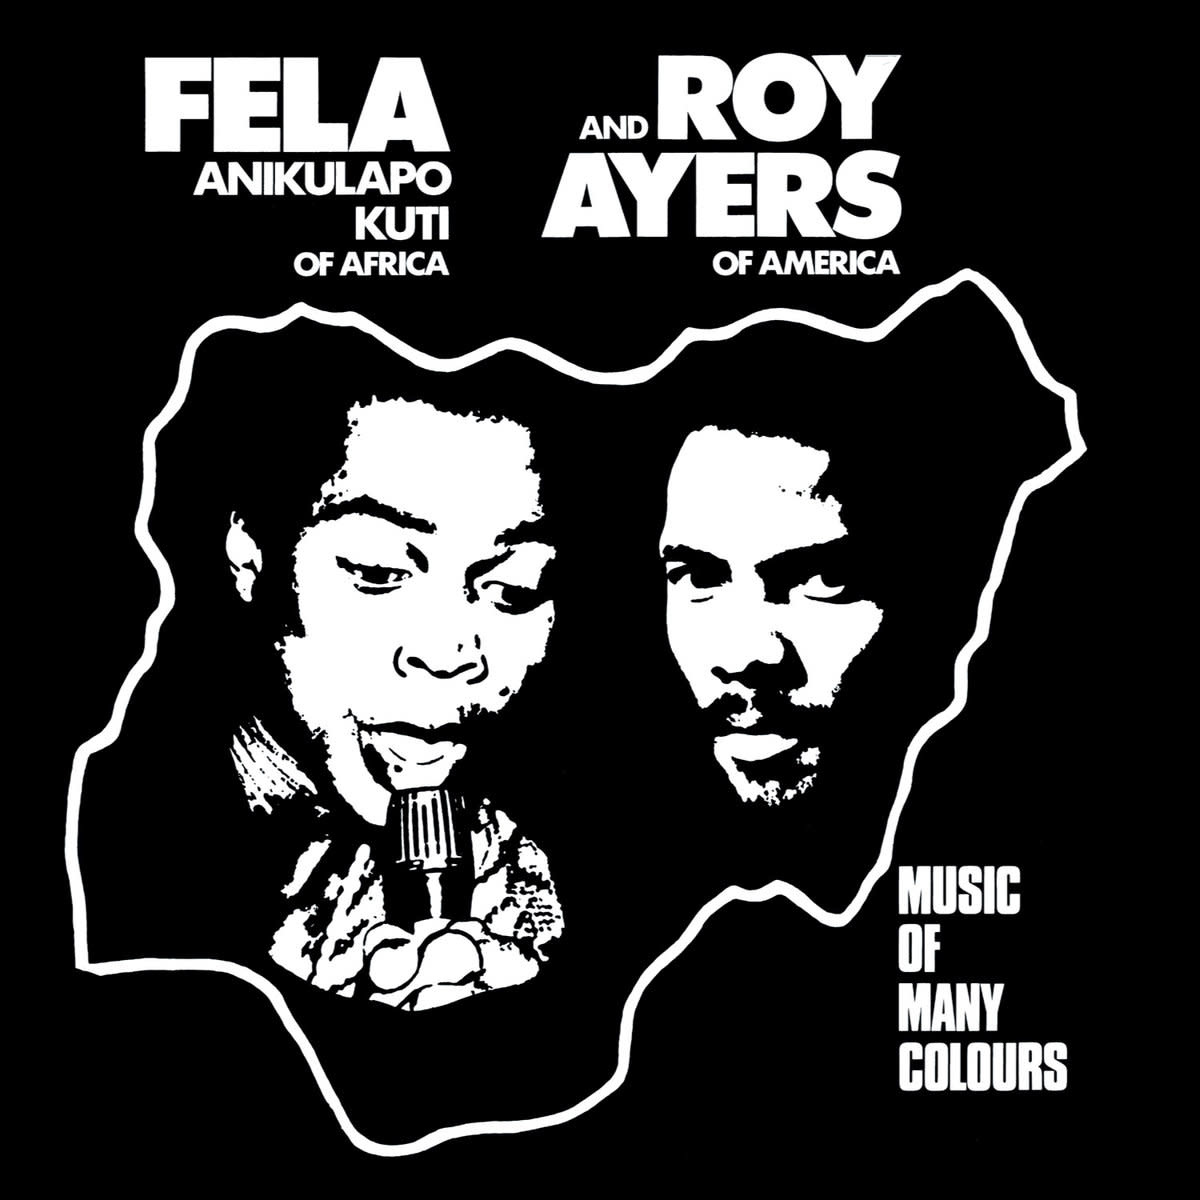 Knitting Factory Records Fela Kuti & Roy Ayers - Music of Many Colours